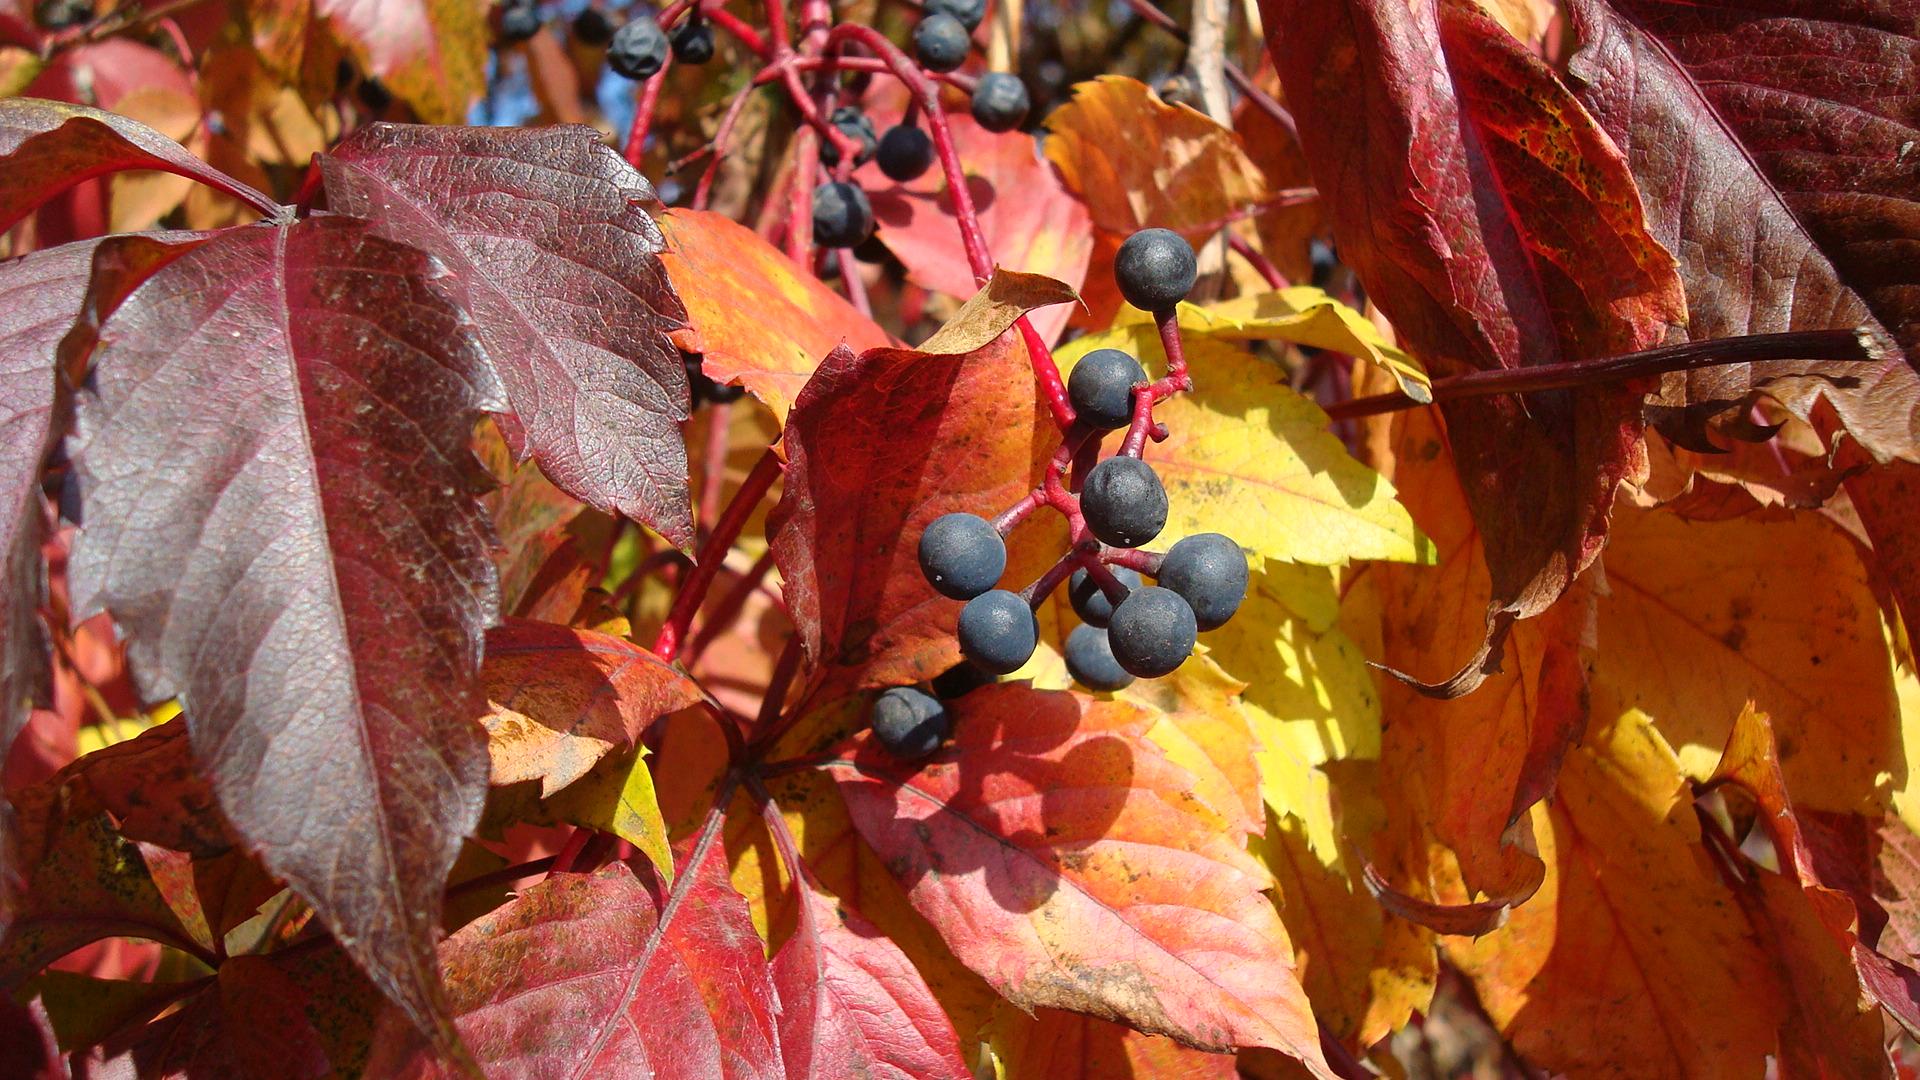 Времена года: Осень | Уроки астрономии